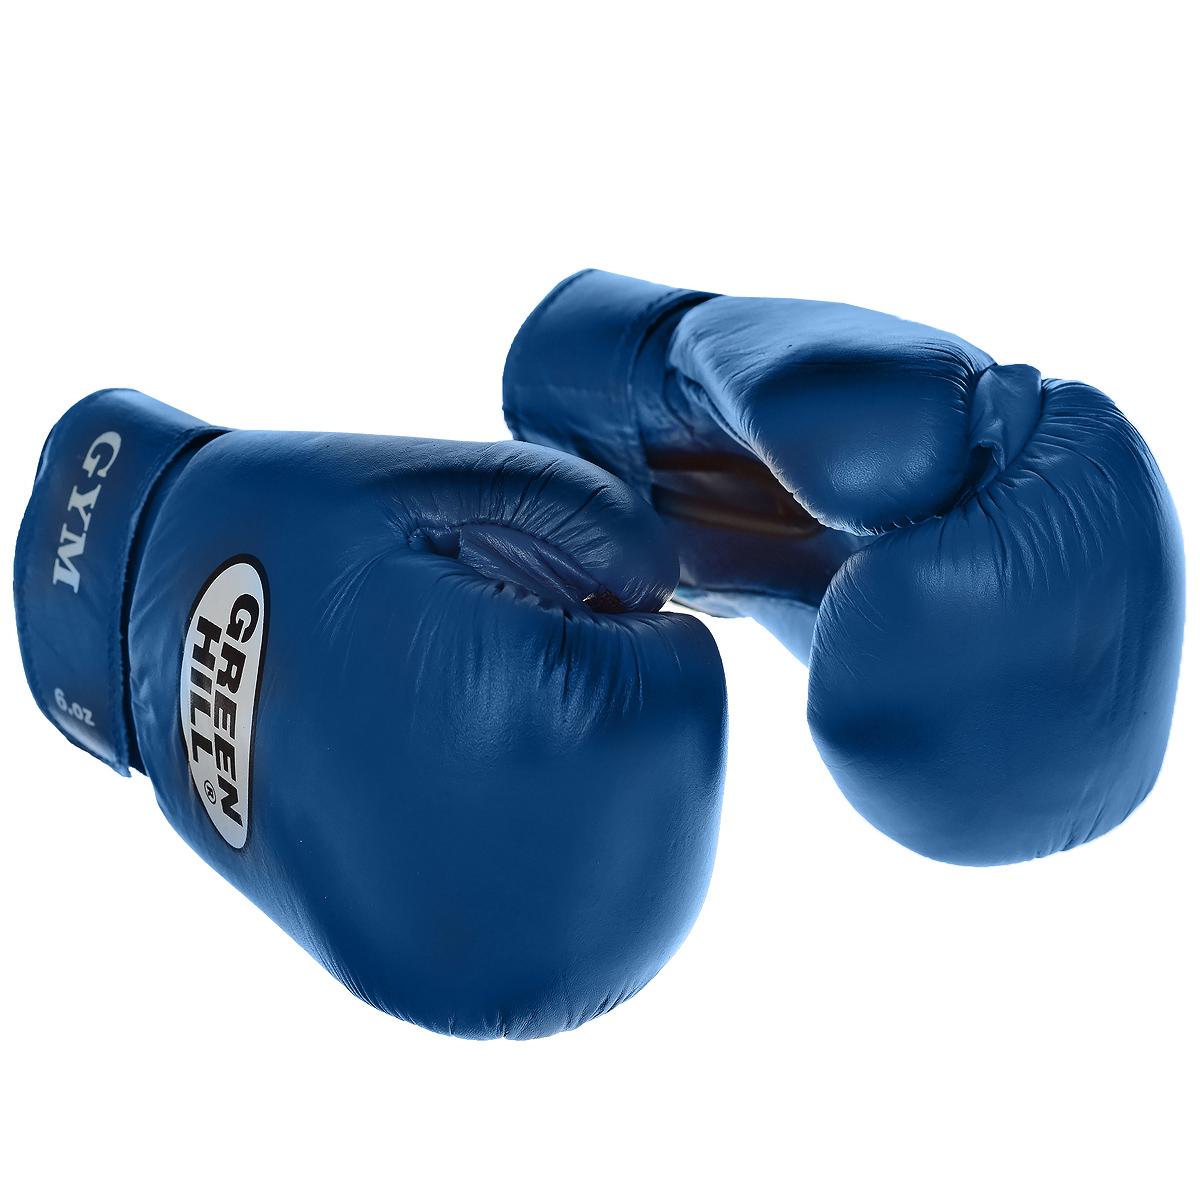 Перчатки боксерские Green Hill Gym, цвет: синий. Вес 10 унций